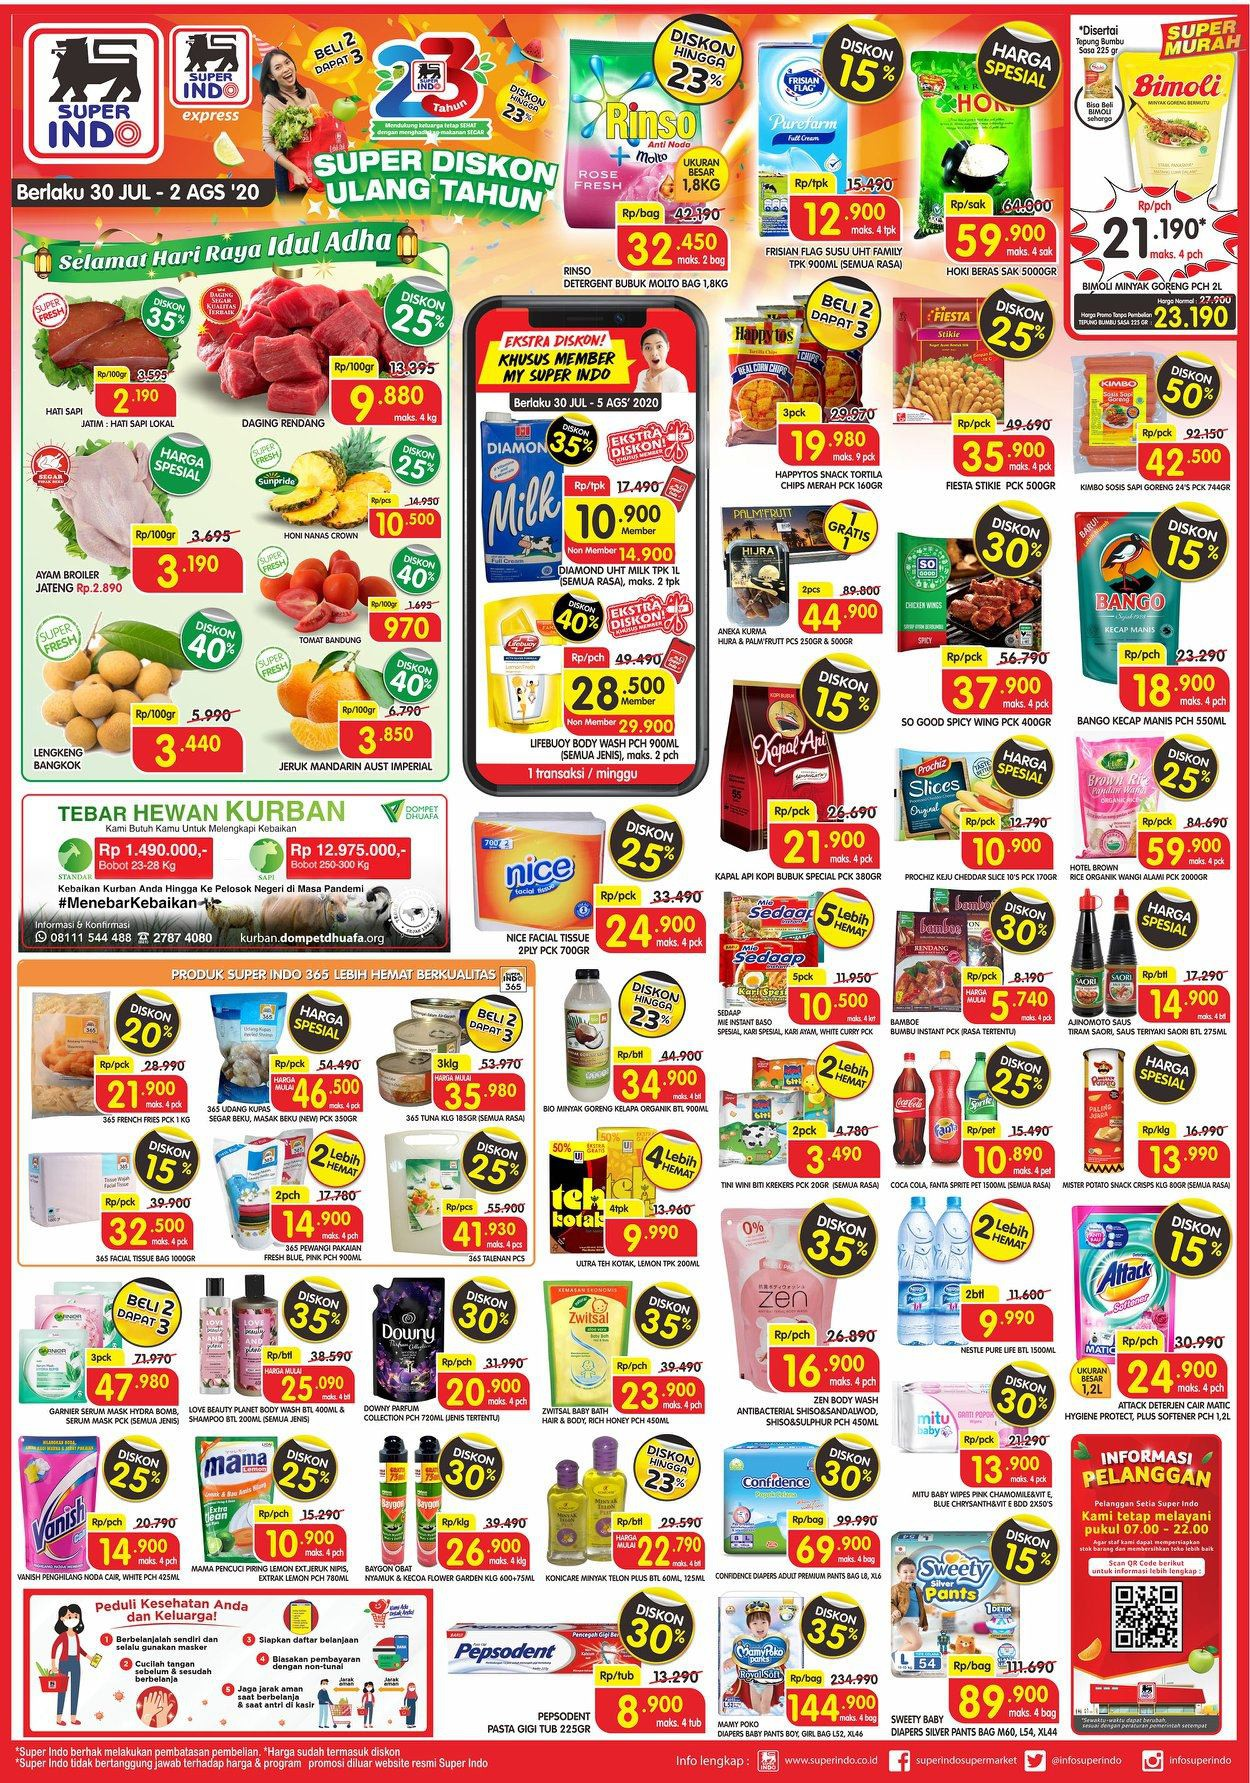 Katalog Promo JSM Superindo Periode 30 Juli - 2 Agustus 2020